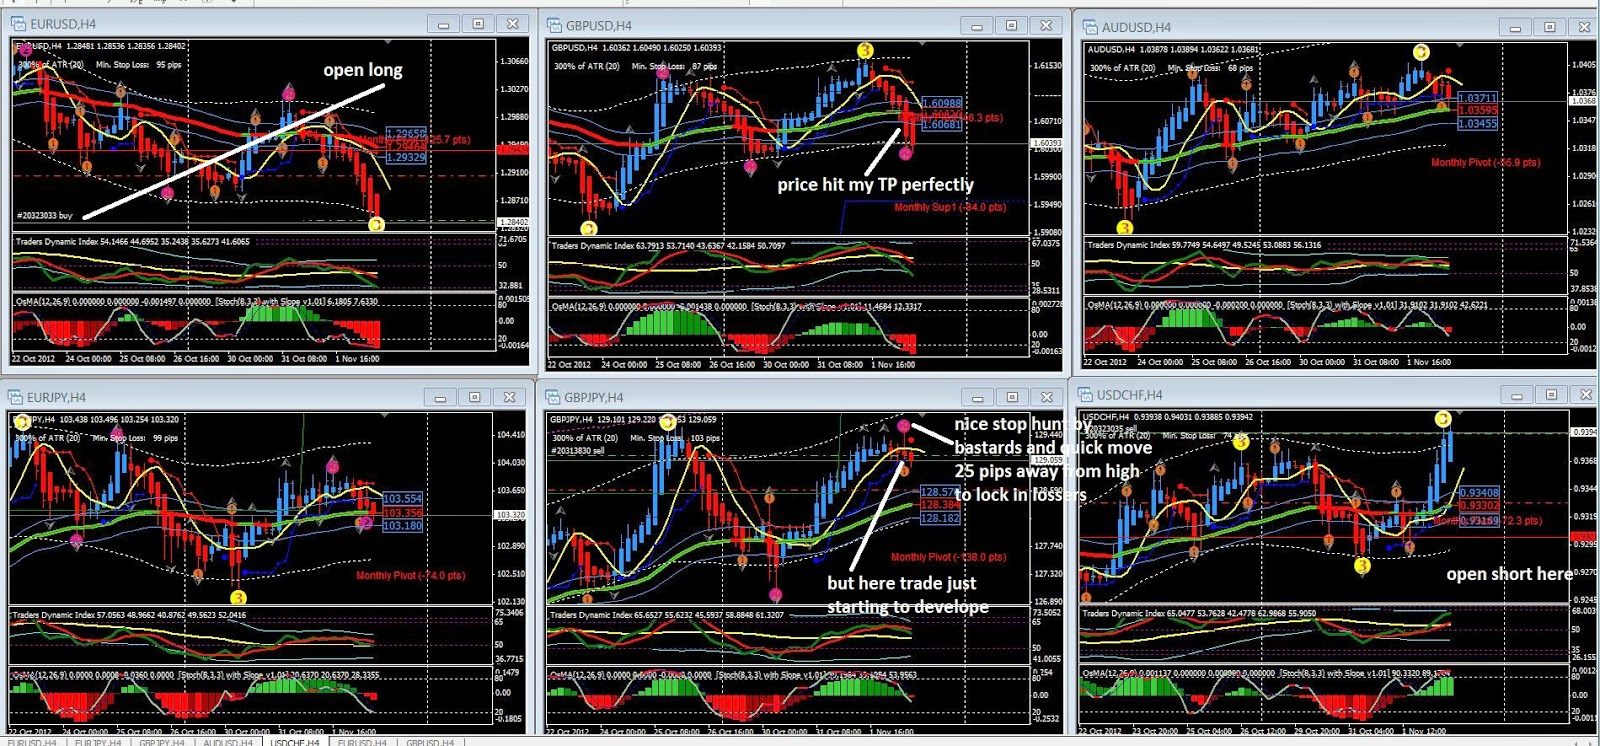 Market profile trading signals